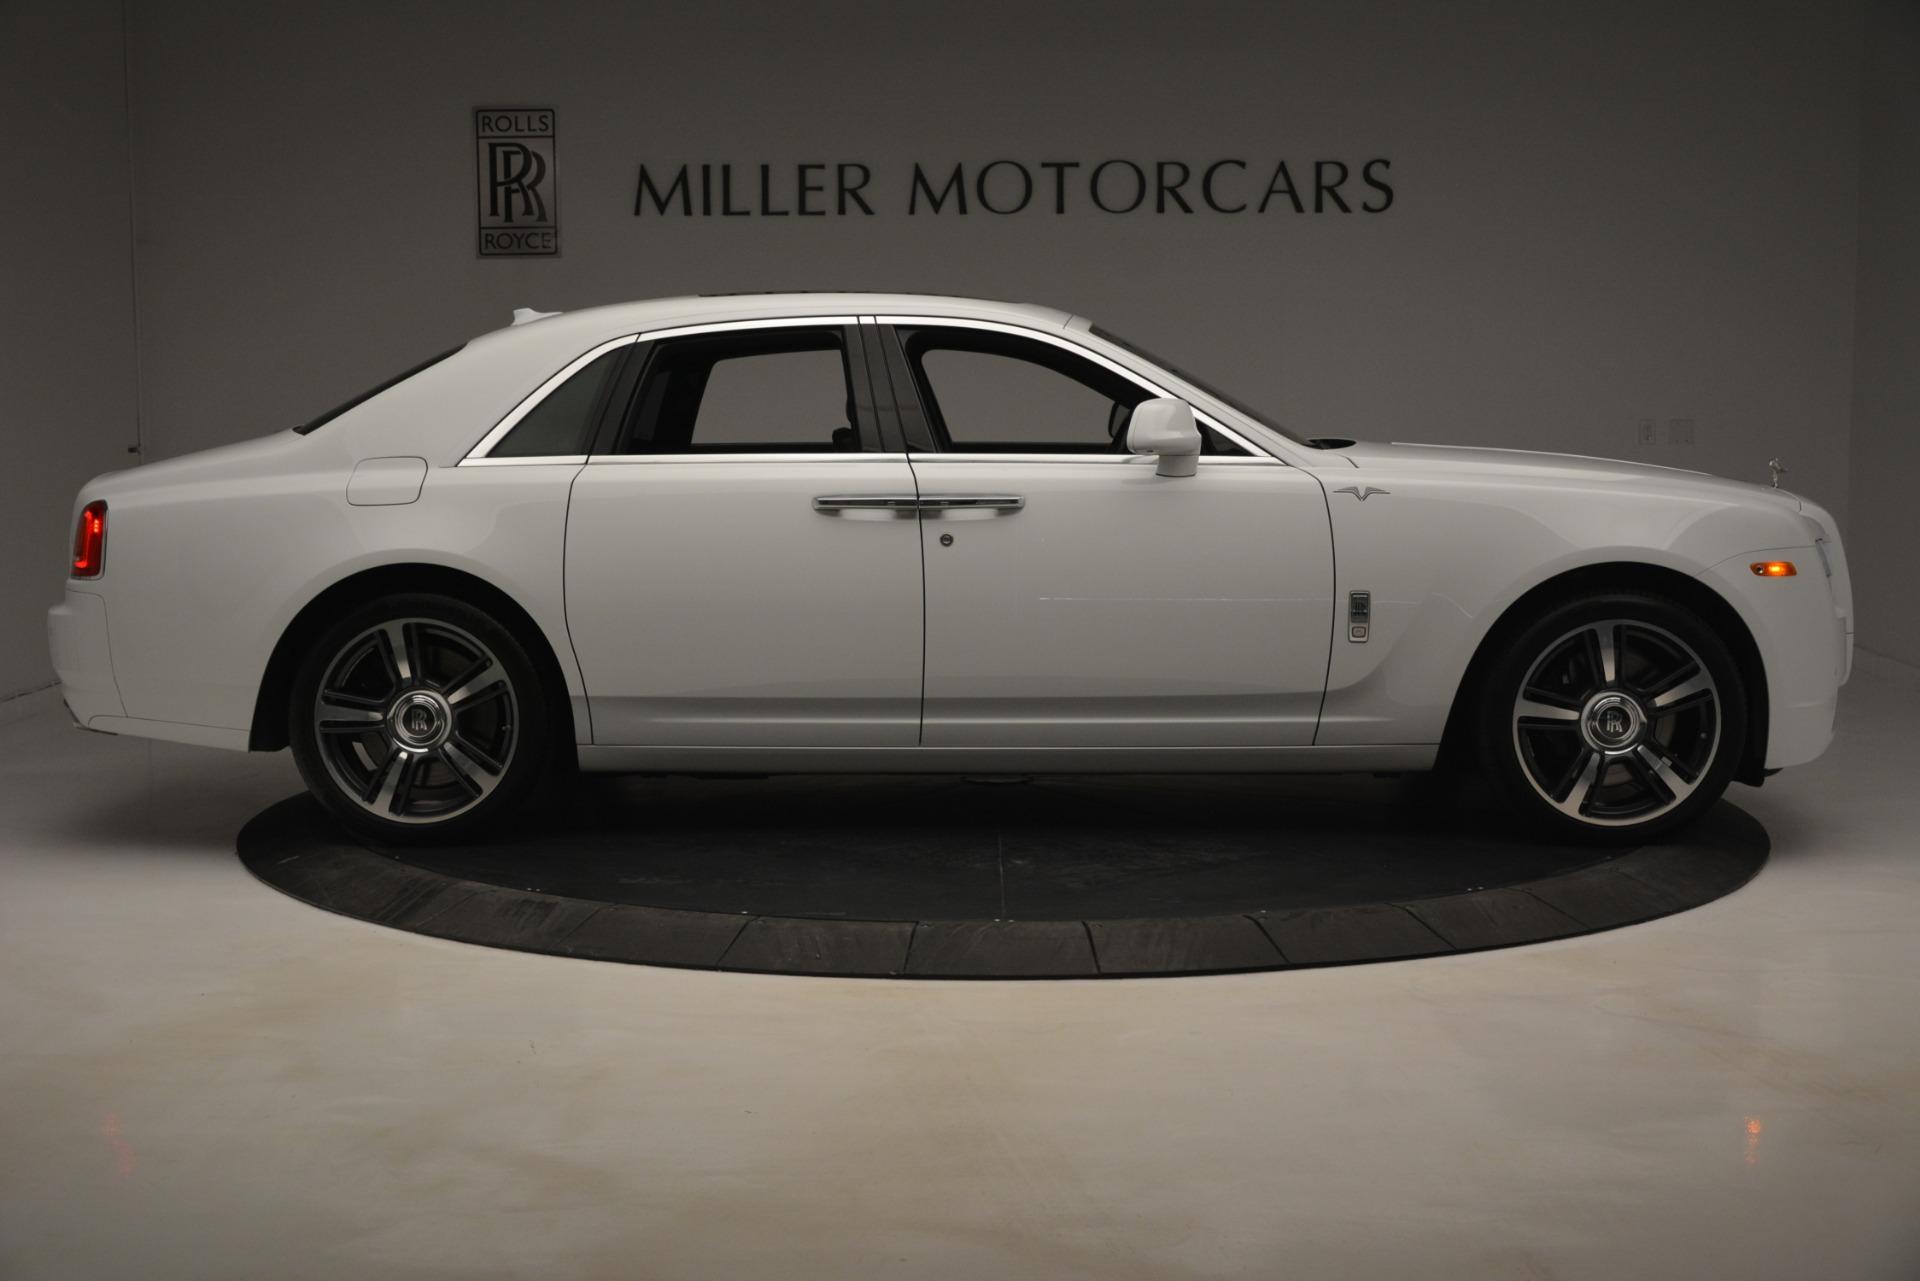 Used 2014 Rolls-Royce Ghost V-Spec For Sale In Westport, CT 2989_p11